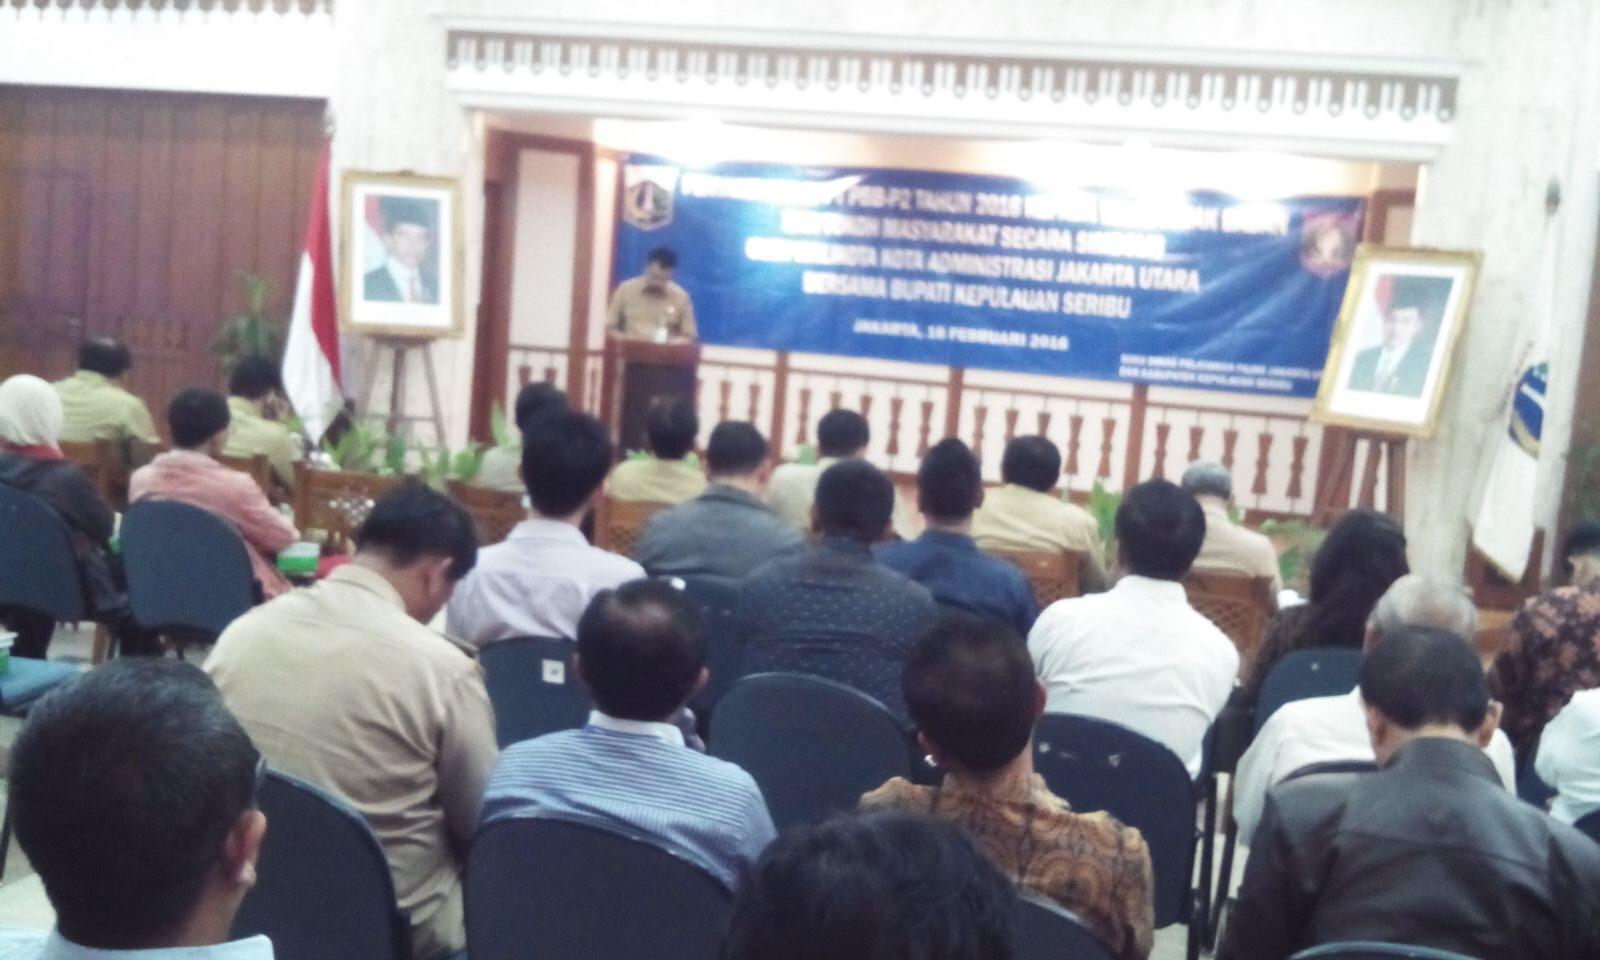 Kasudin Pelayanan Pajak Jakarta Utara Selkiansyah memberikan sambutan